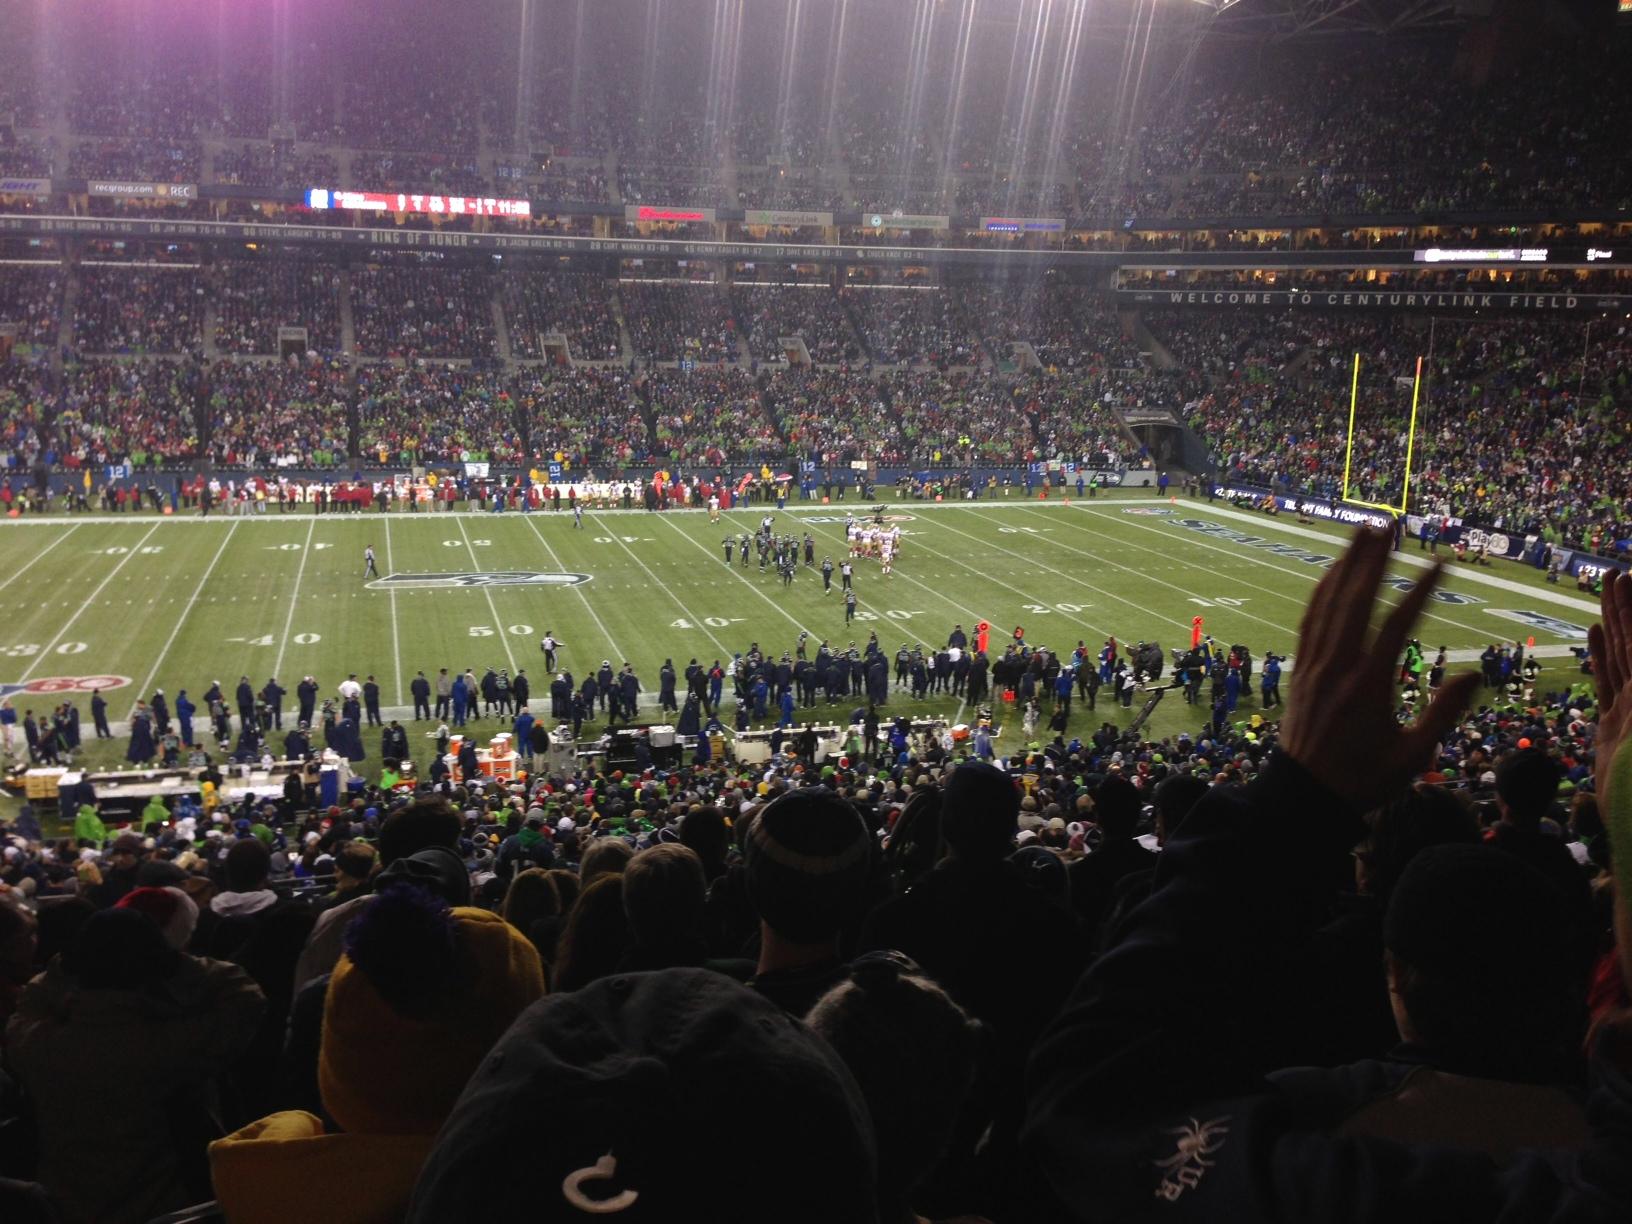 Seahawks punish the Niner's, Sunday Dec. 23rd, 2012